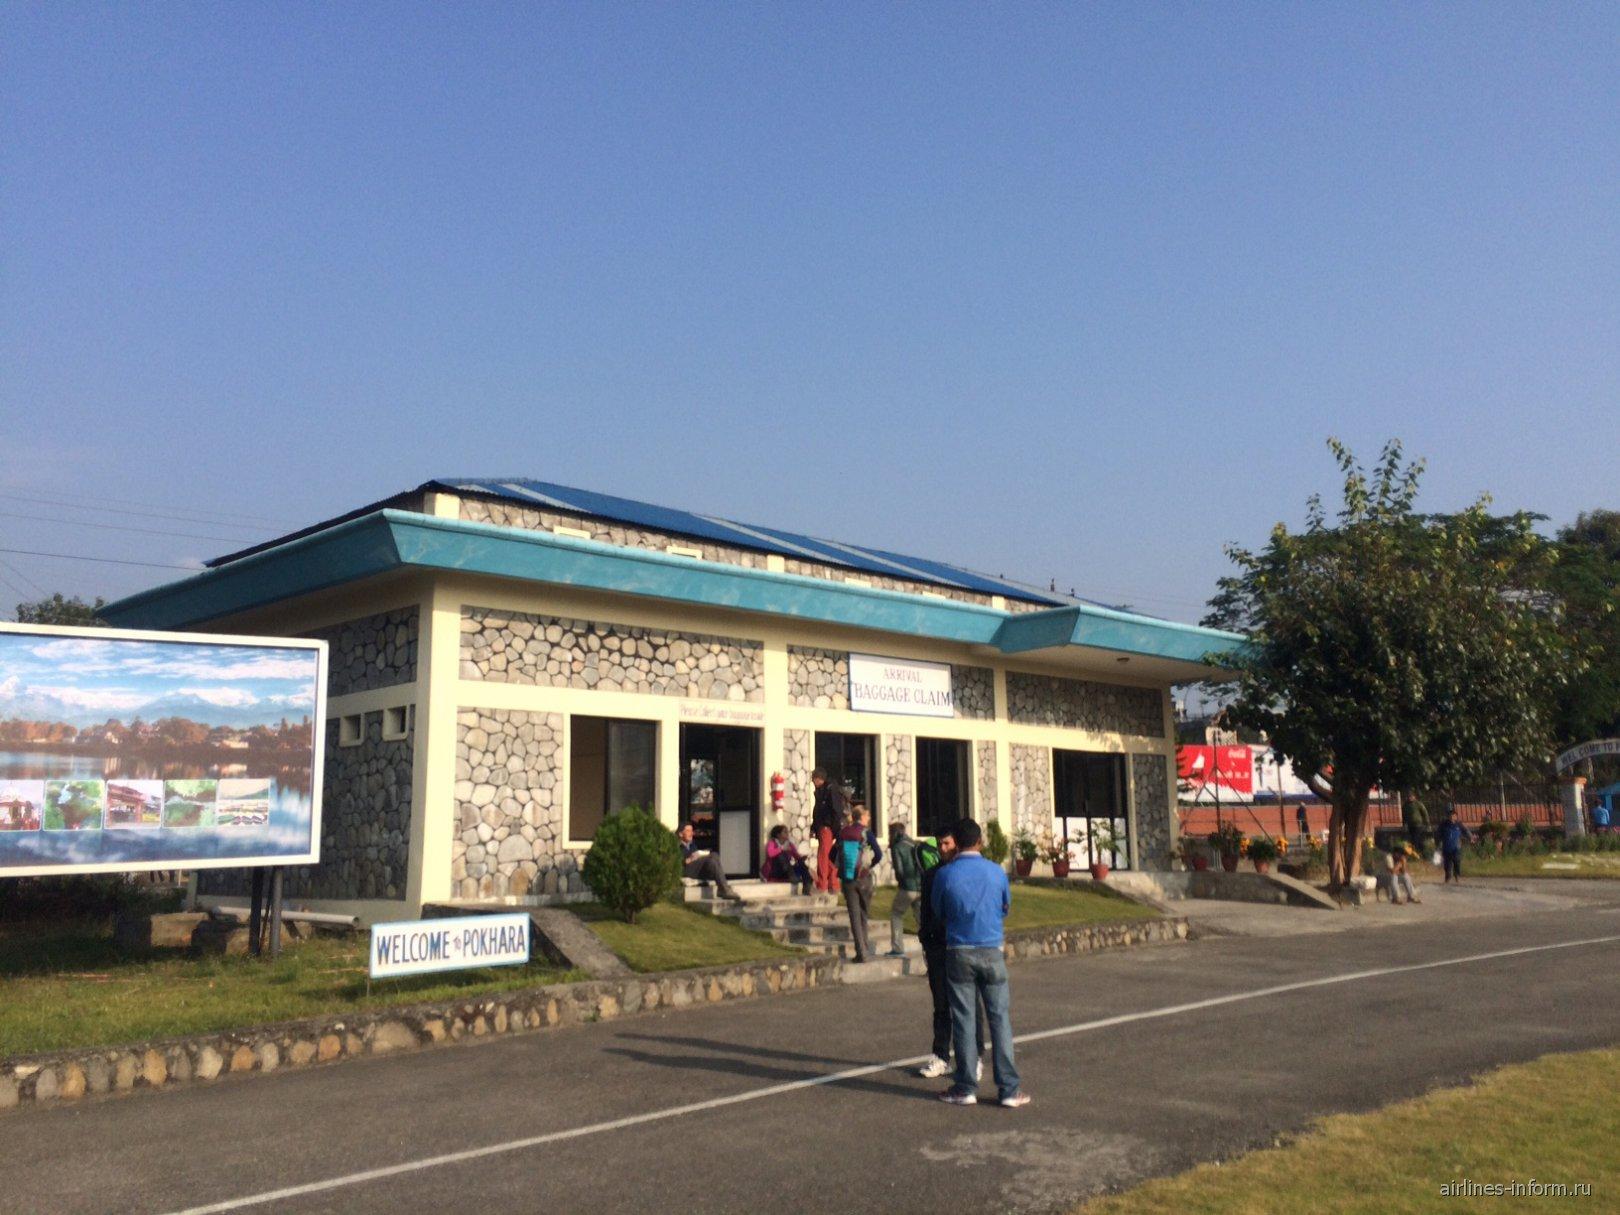 Павильон выдачи багажа в аэропорту Покхара